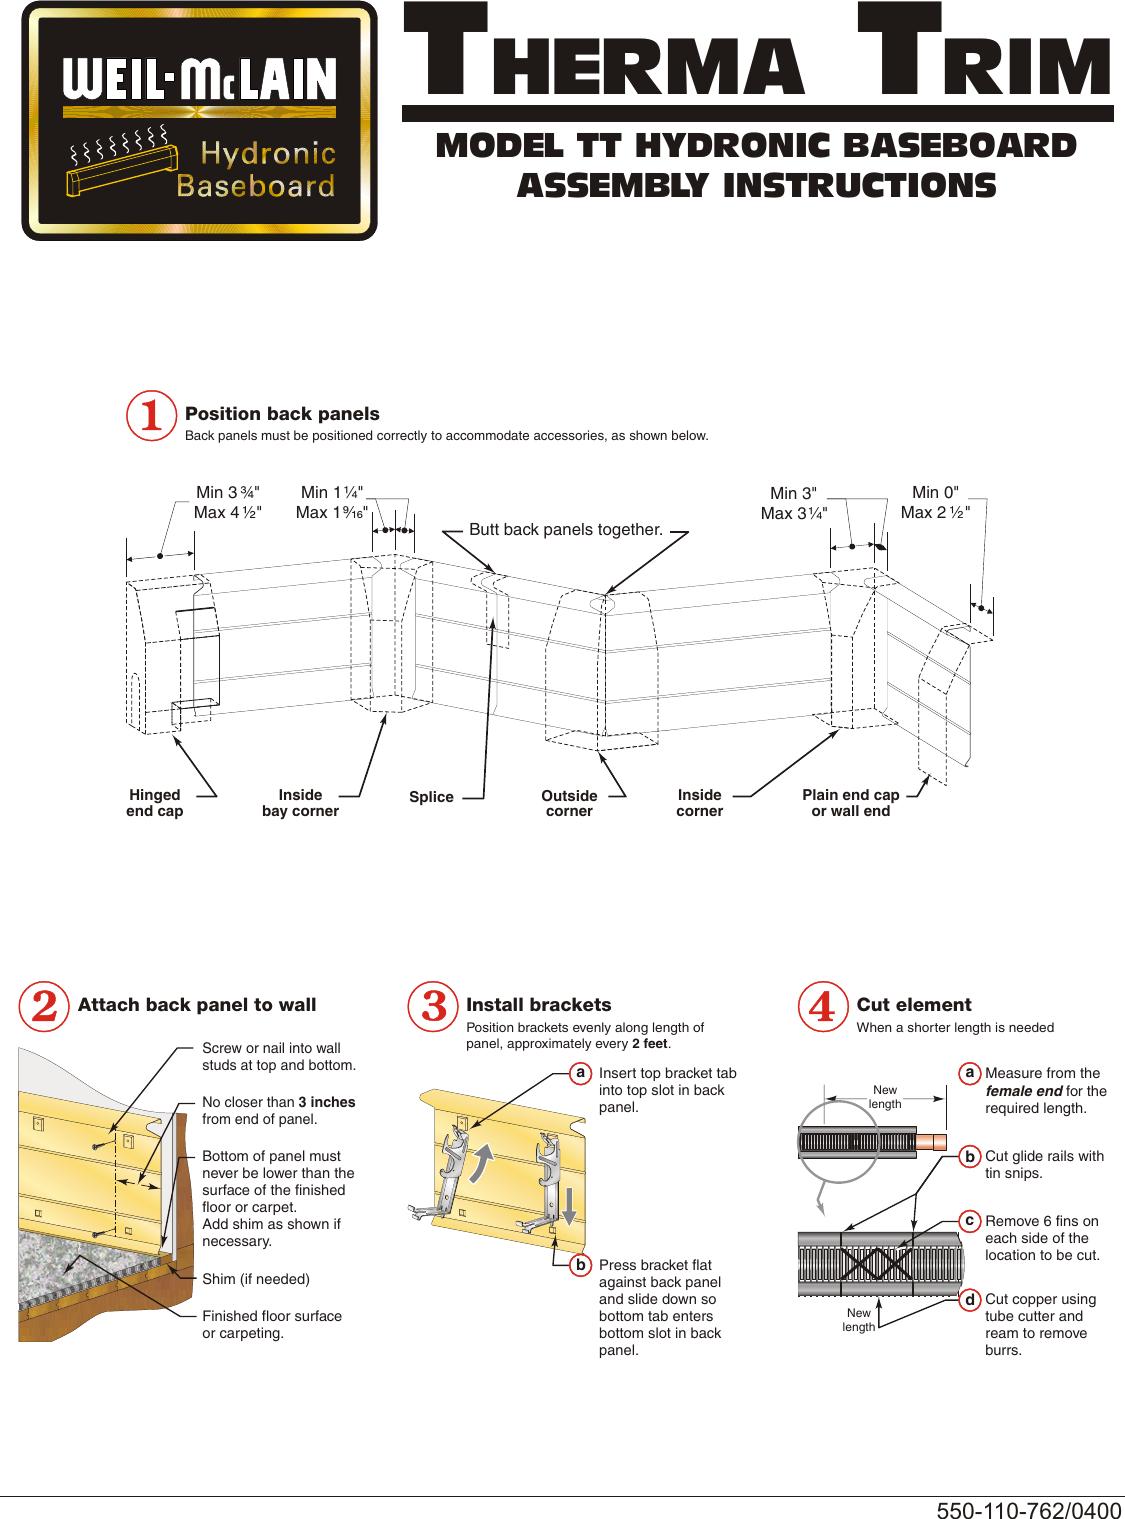 Fancy Weil Mclain Radiators Crest - Electrical Diagram Ideas ...